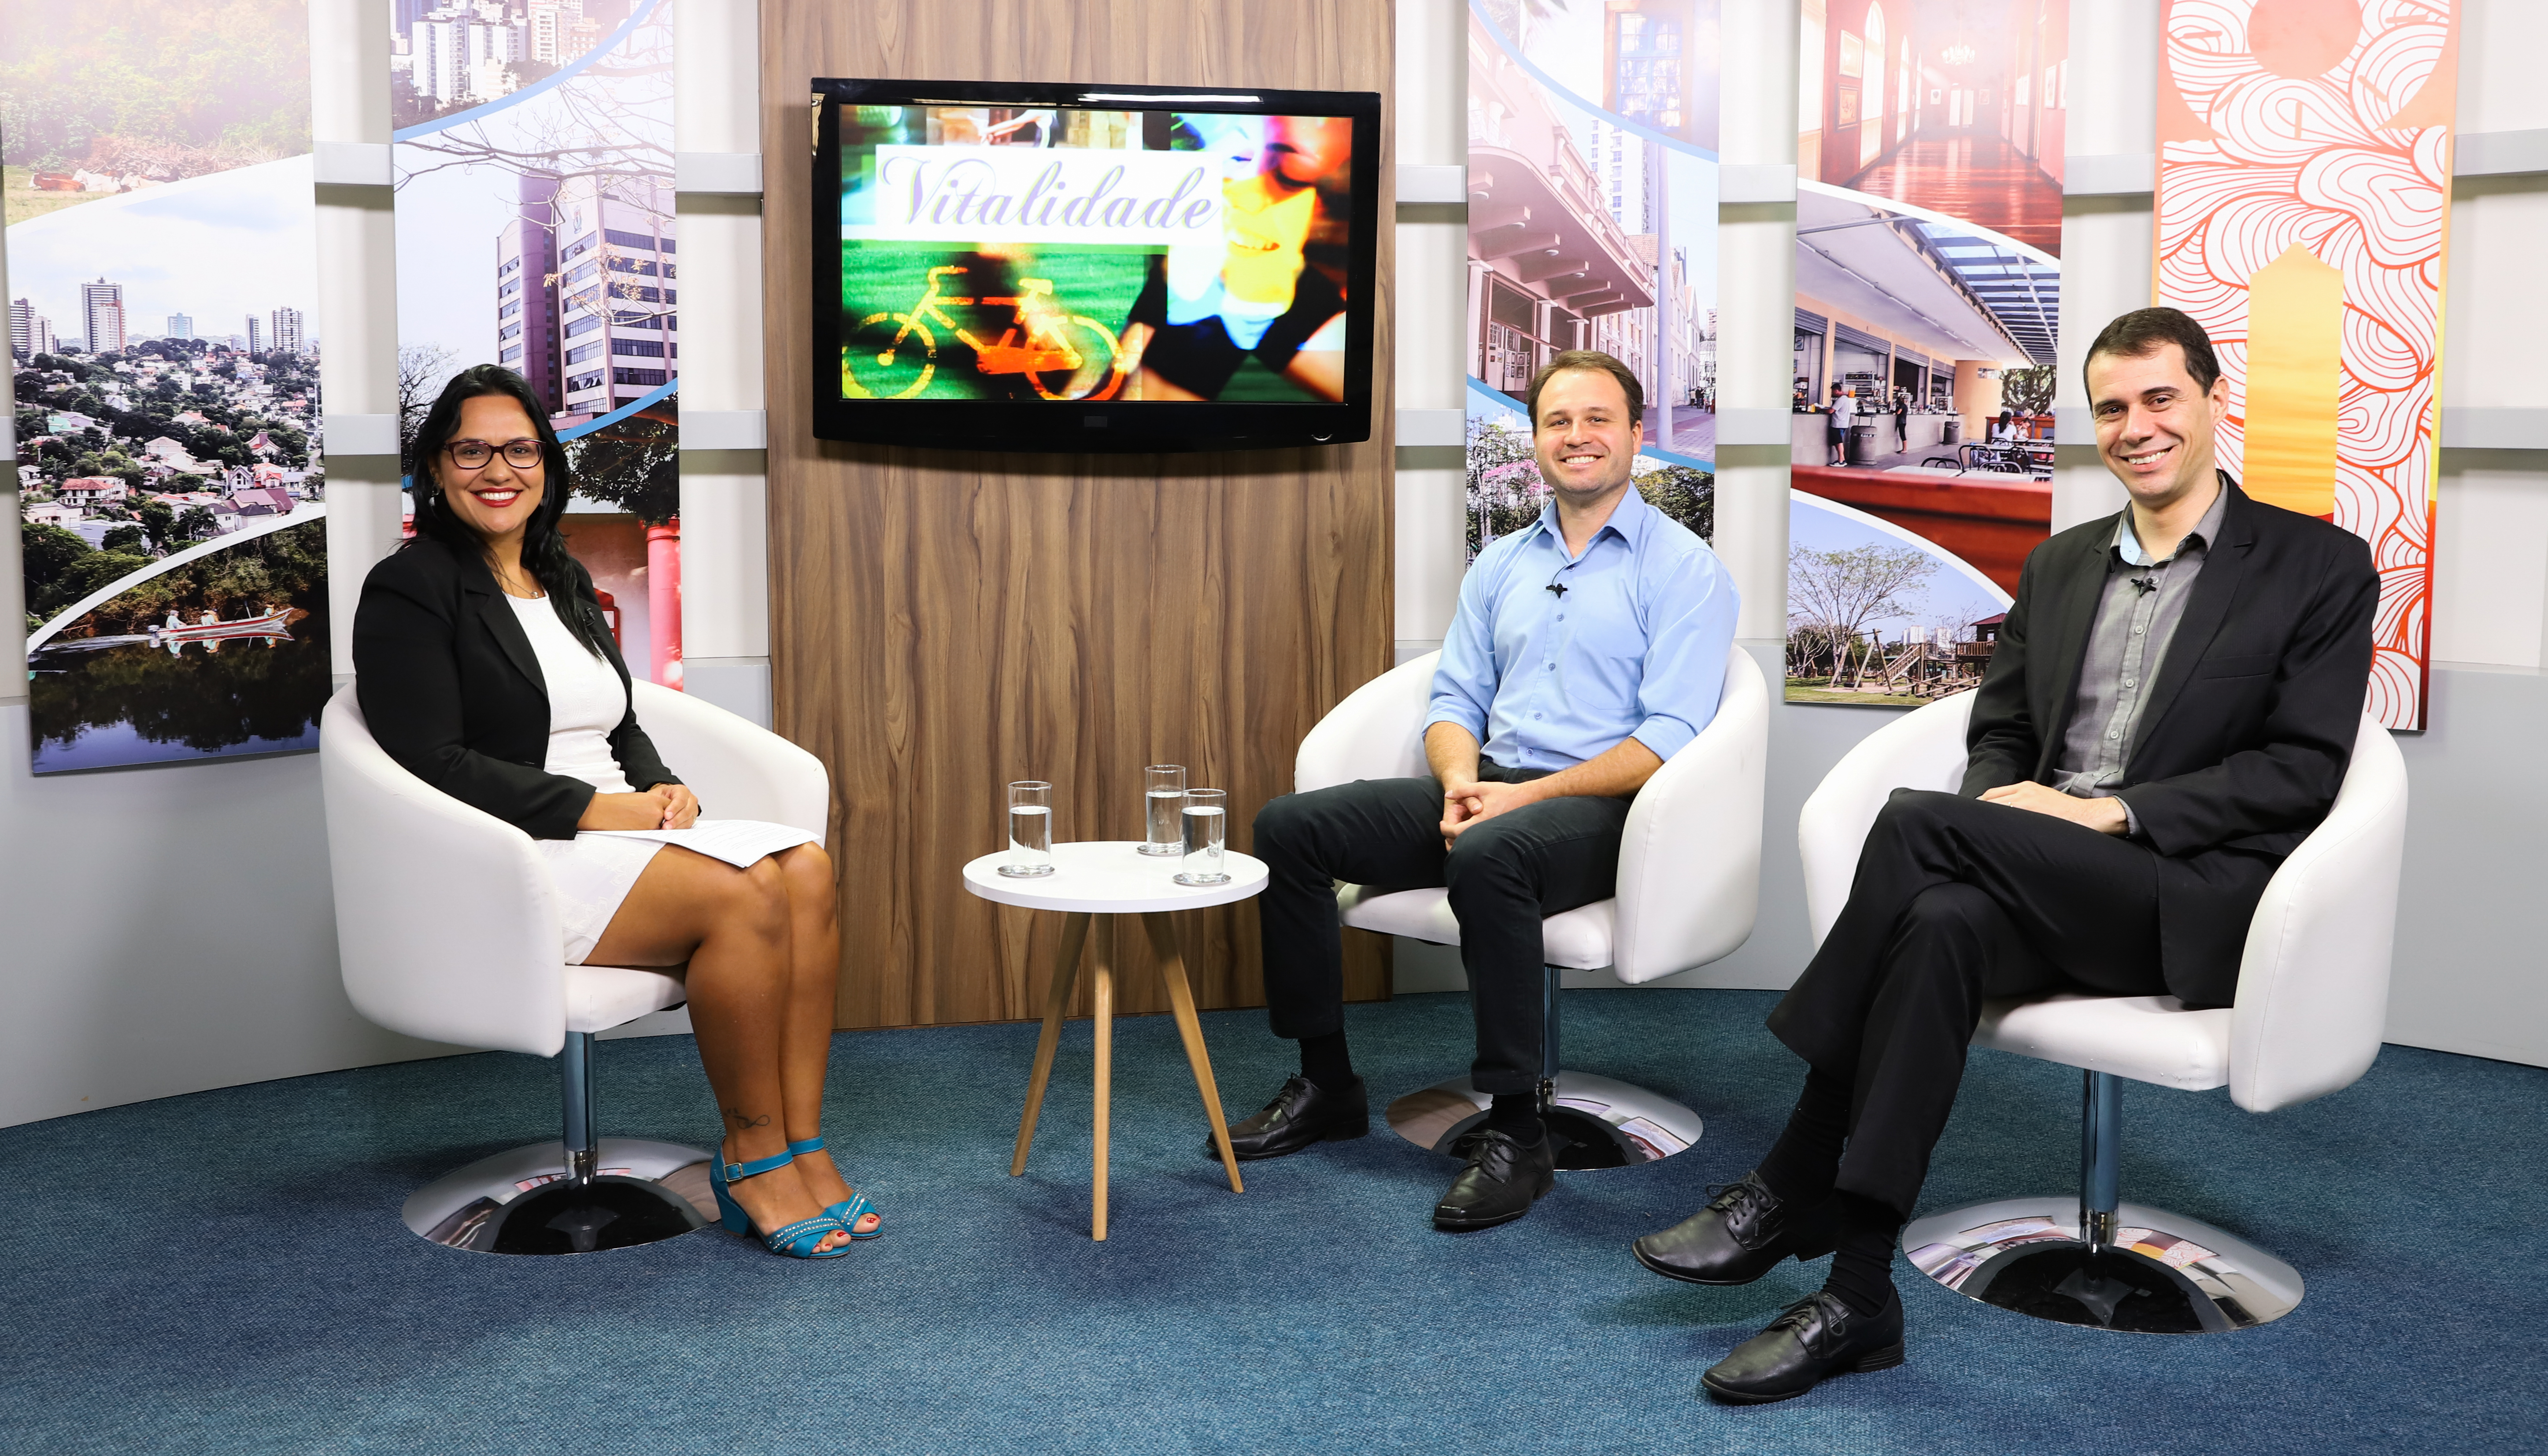 TV Câmara – Vitalidade aborda qualidade de vida dos idosos